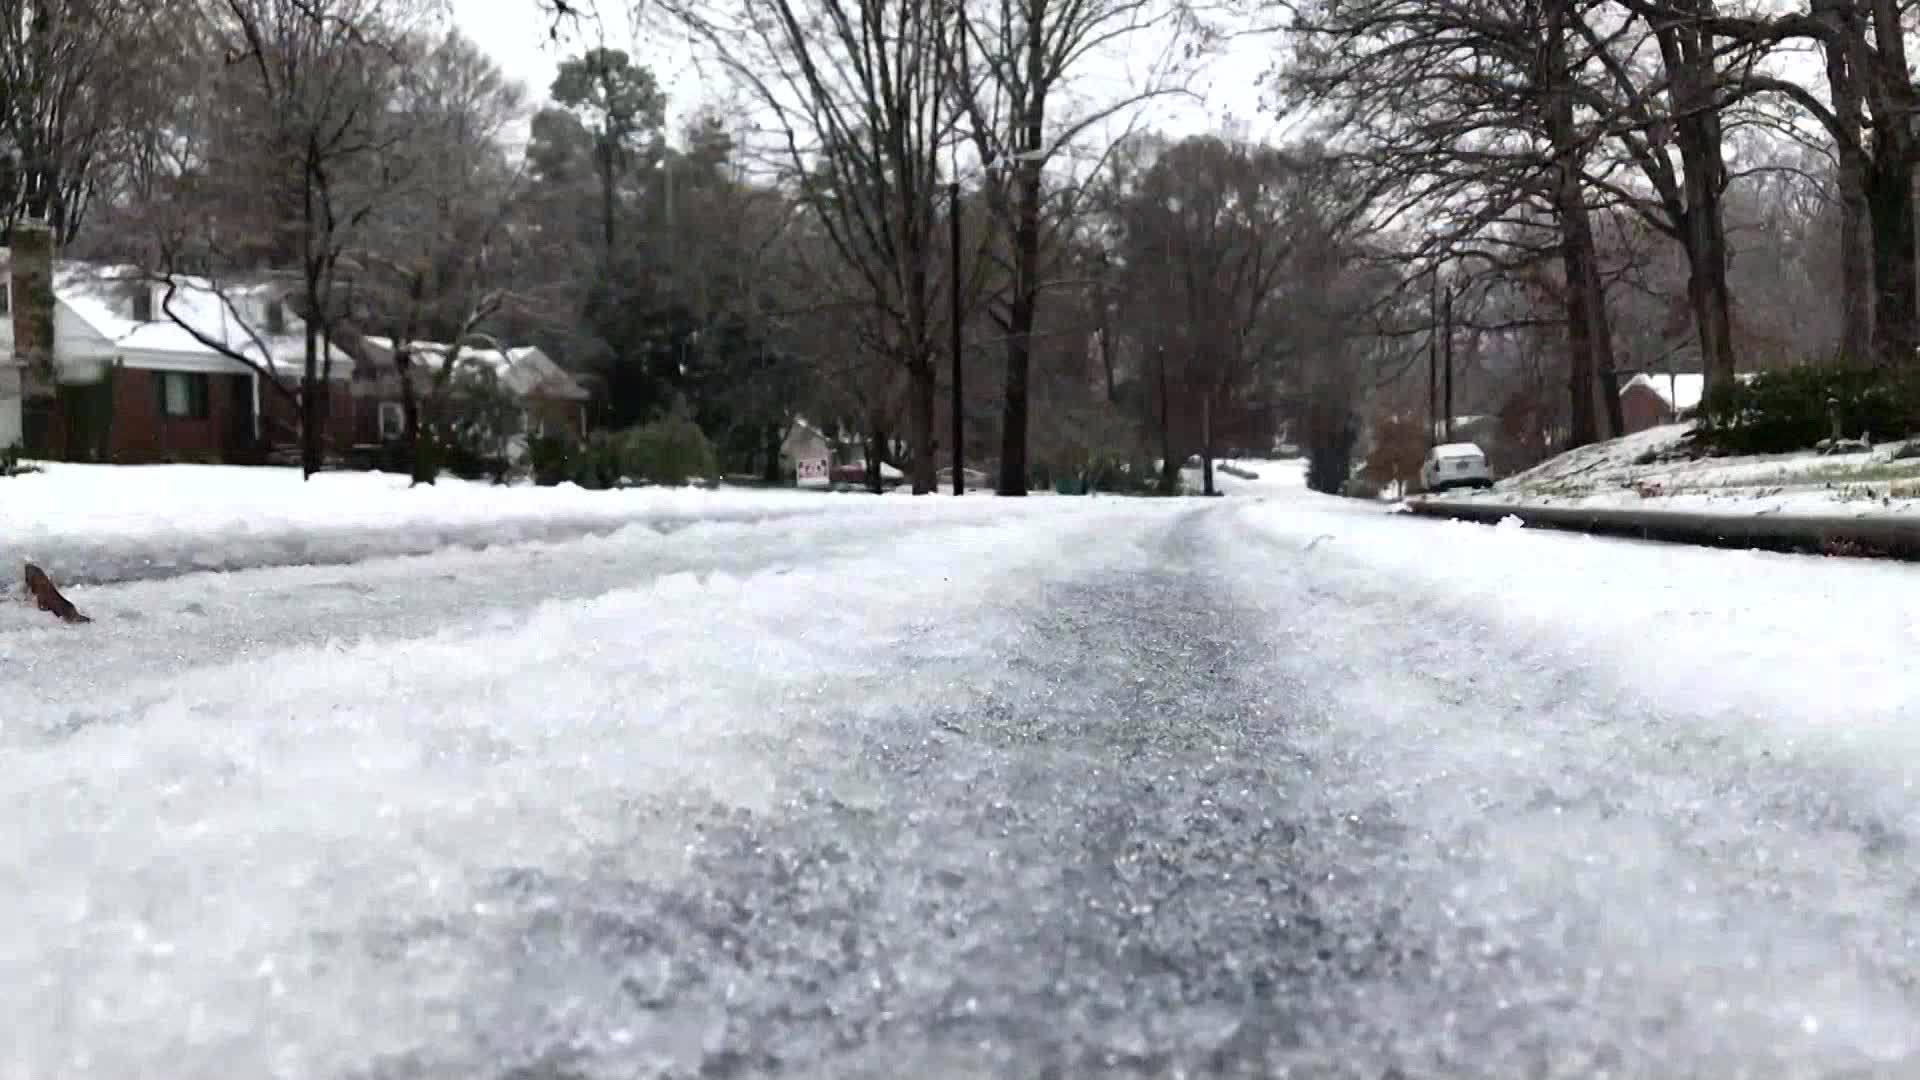 Winter_storm_hits_Southeast_0_20181210104756